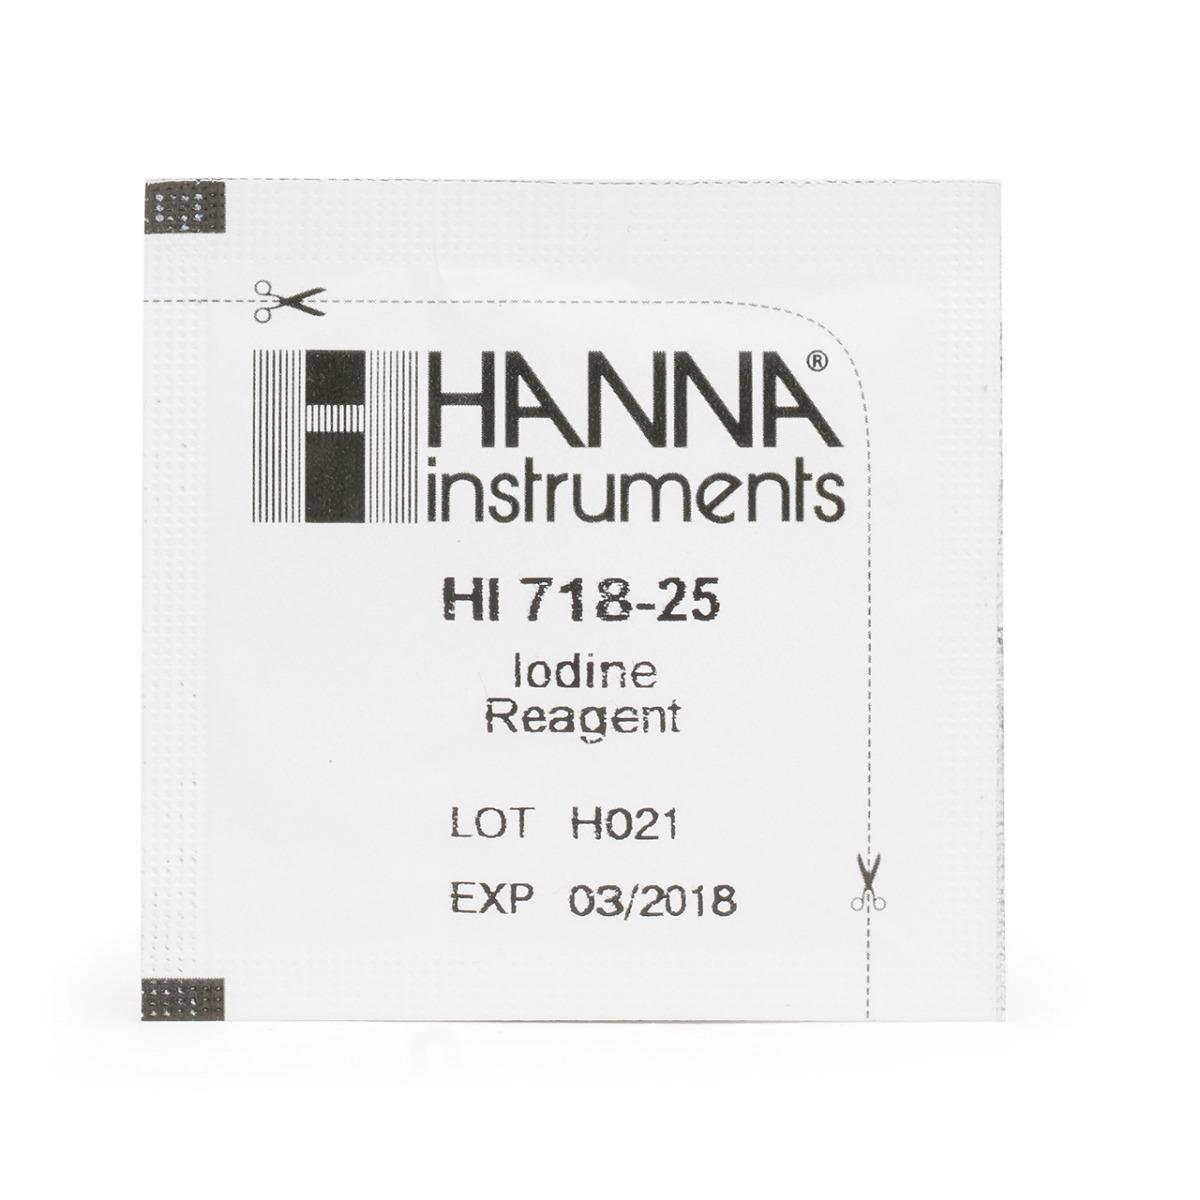 HI718-25 Iodine Checker® Reagents (25 tests)